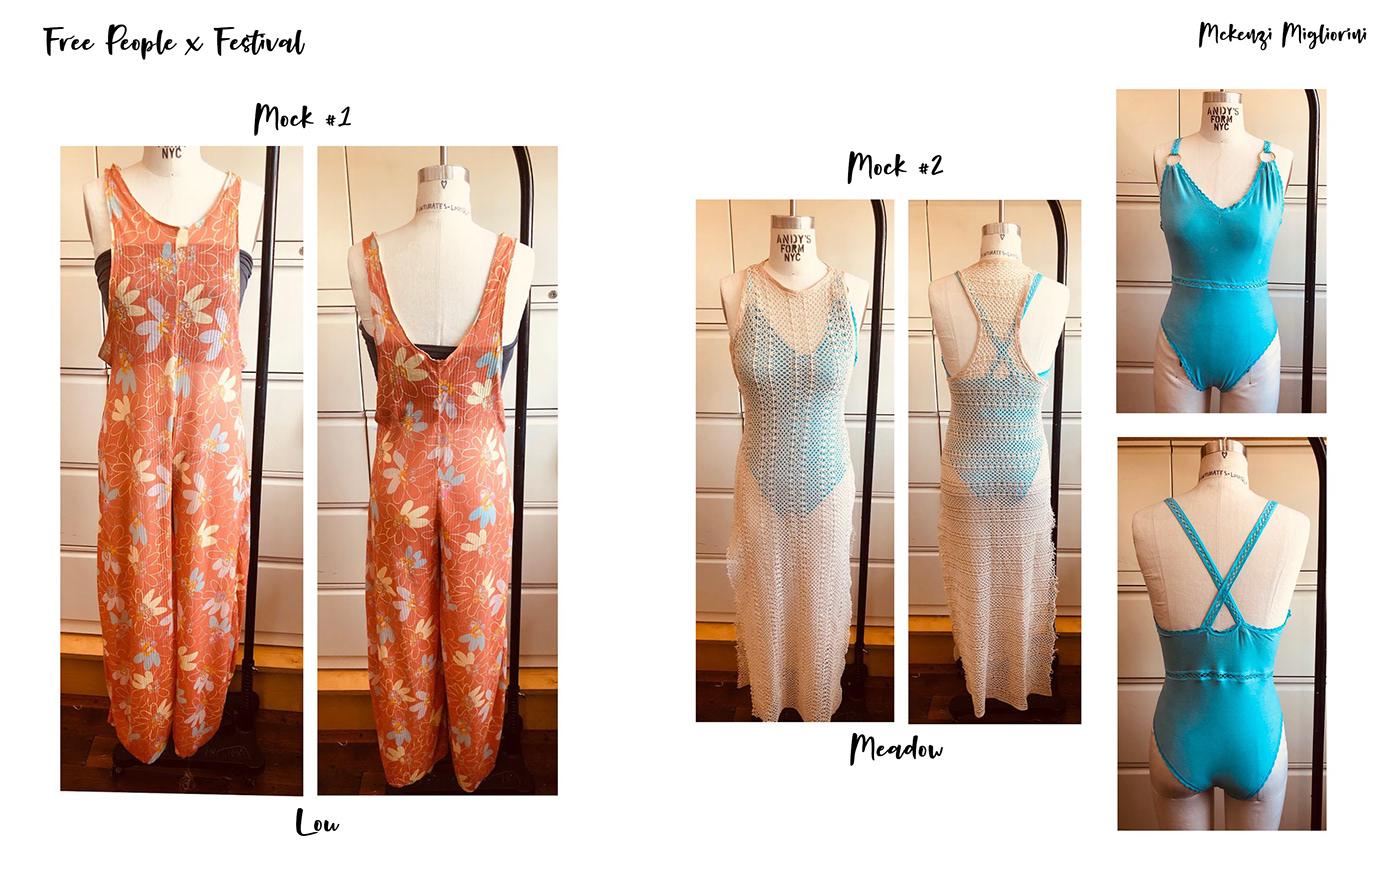 free people fashion design fashion illustration technical flats trend concept development story mood print mocks